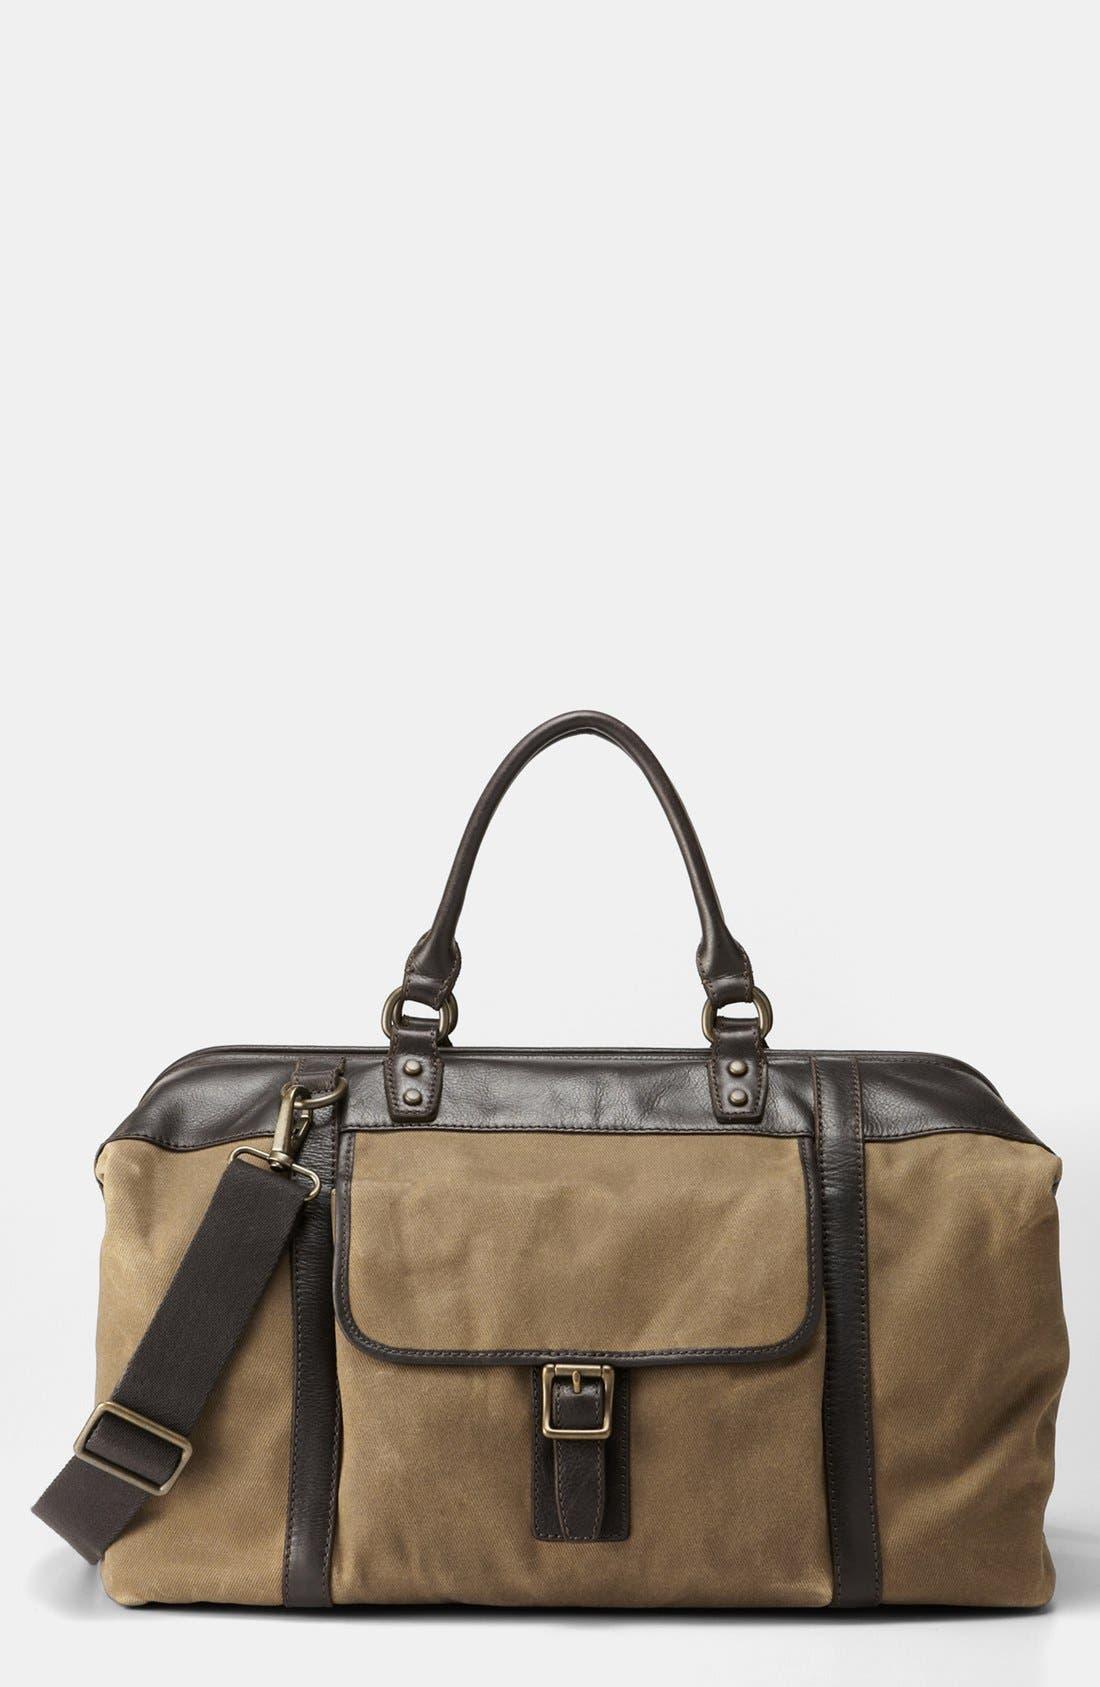 Alternate Image 1 Selected - Fossil 'Estate' Duffle Bag